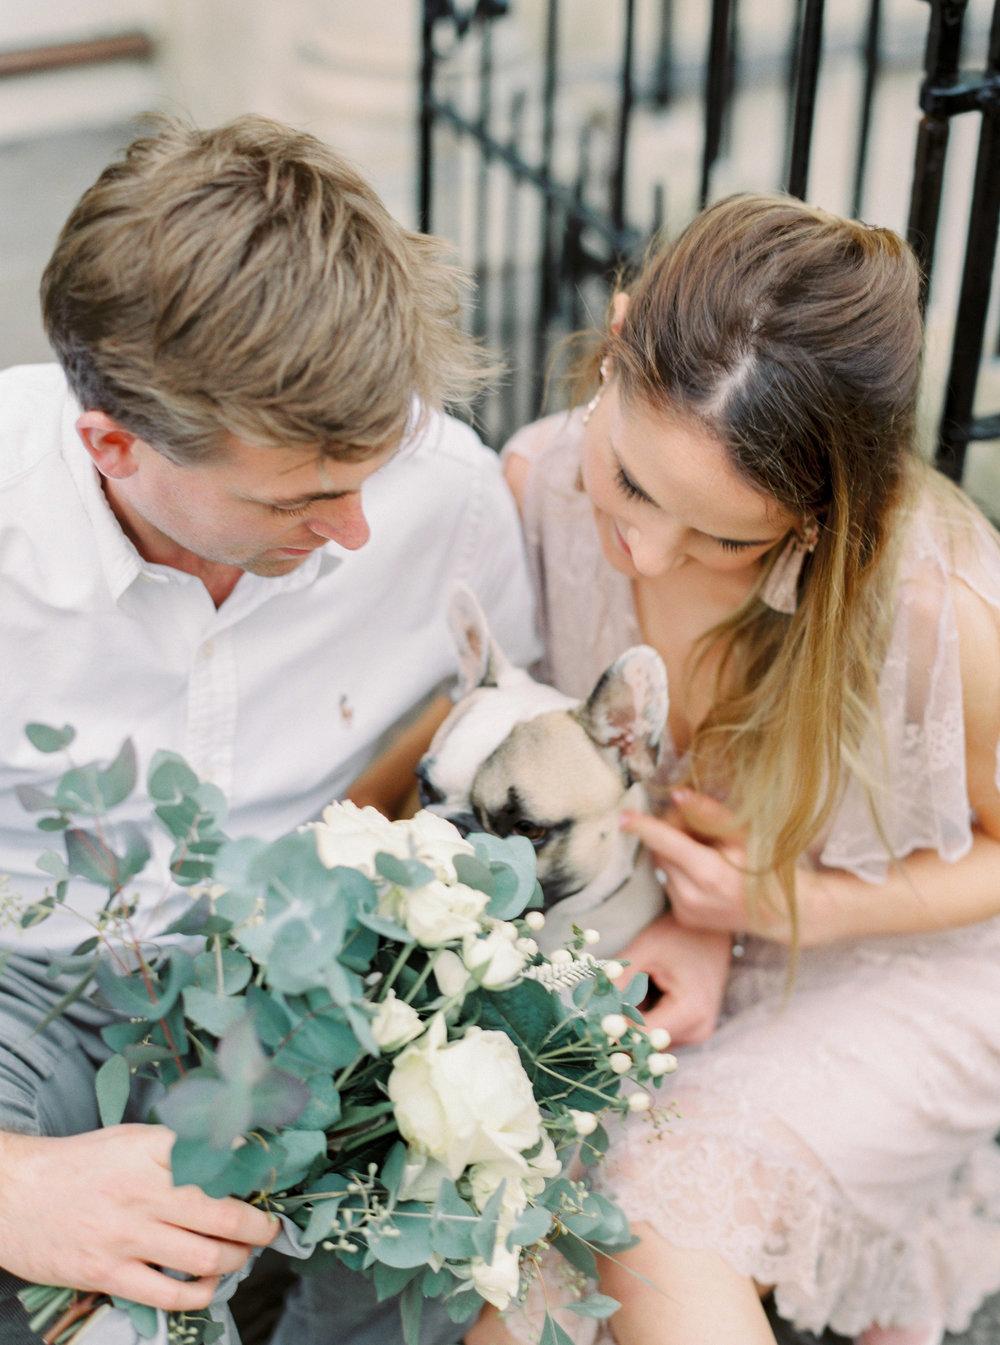 Luxury Wedding Planner UK | Our Chic & Romantic Engagement Shoot in Bath | Katie Julia Photography - 62.JPG